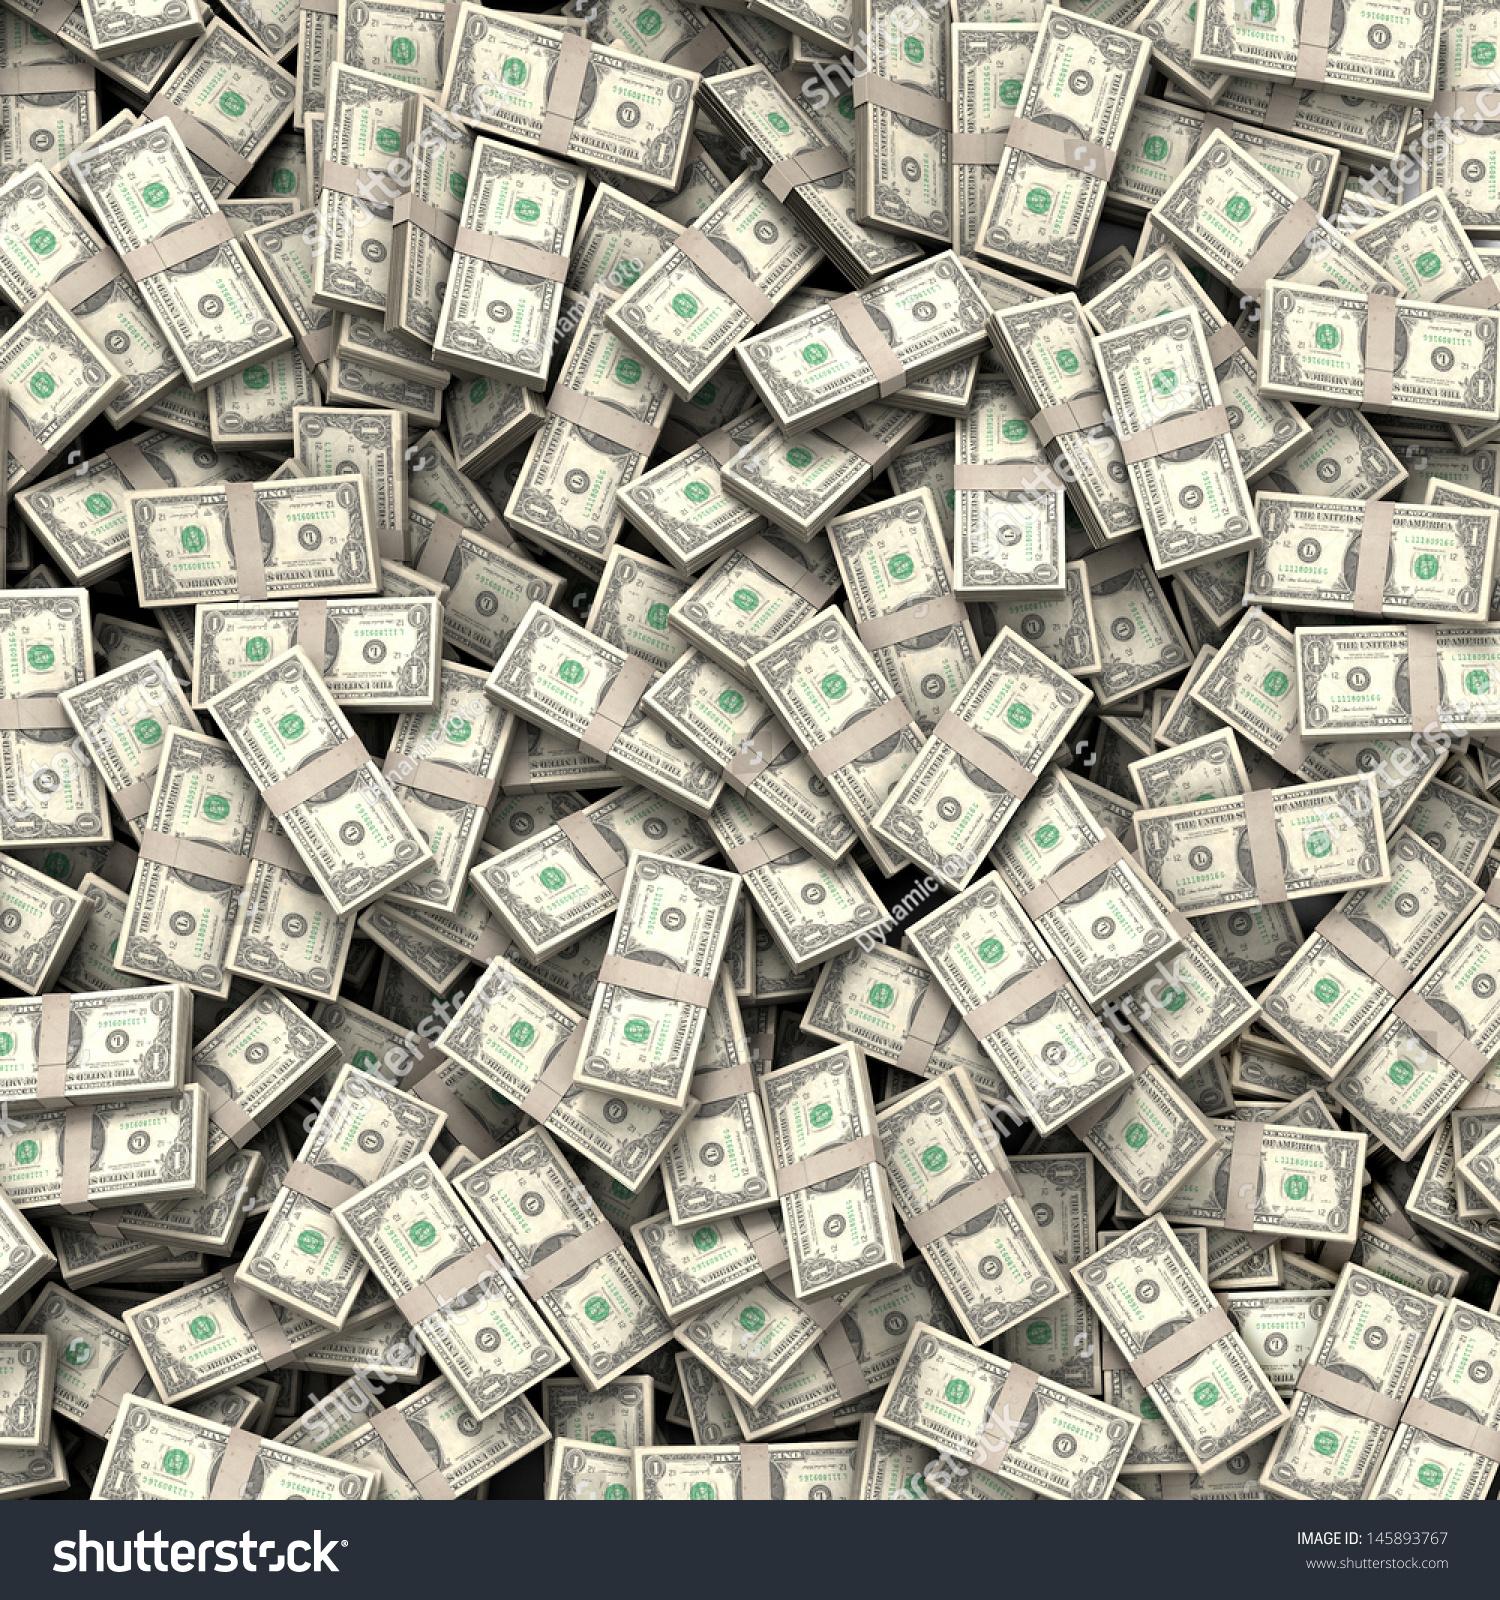 worksheet Money Bills money bills background stock illustration 145893767 shutterstock background